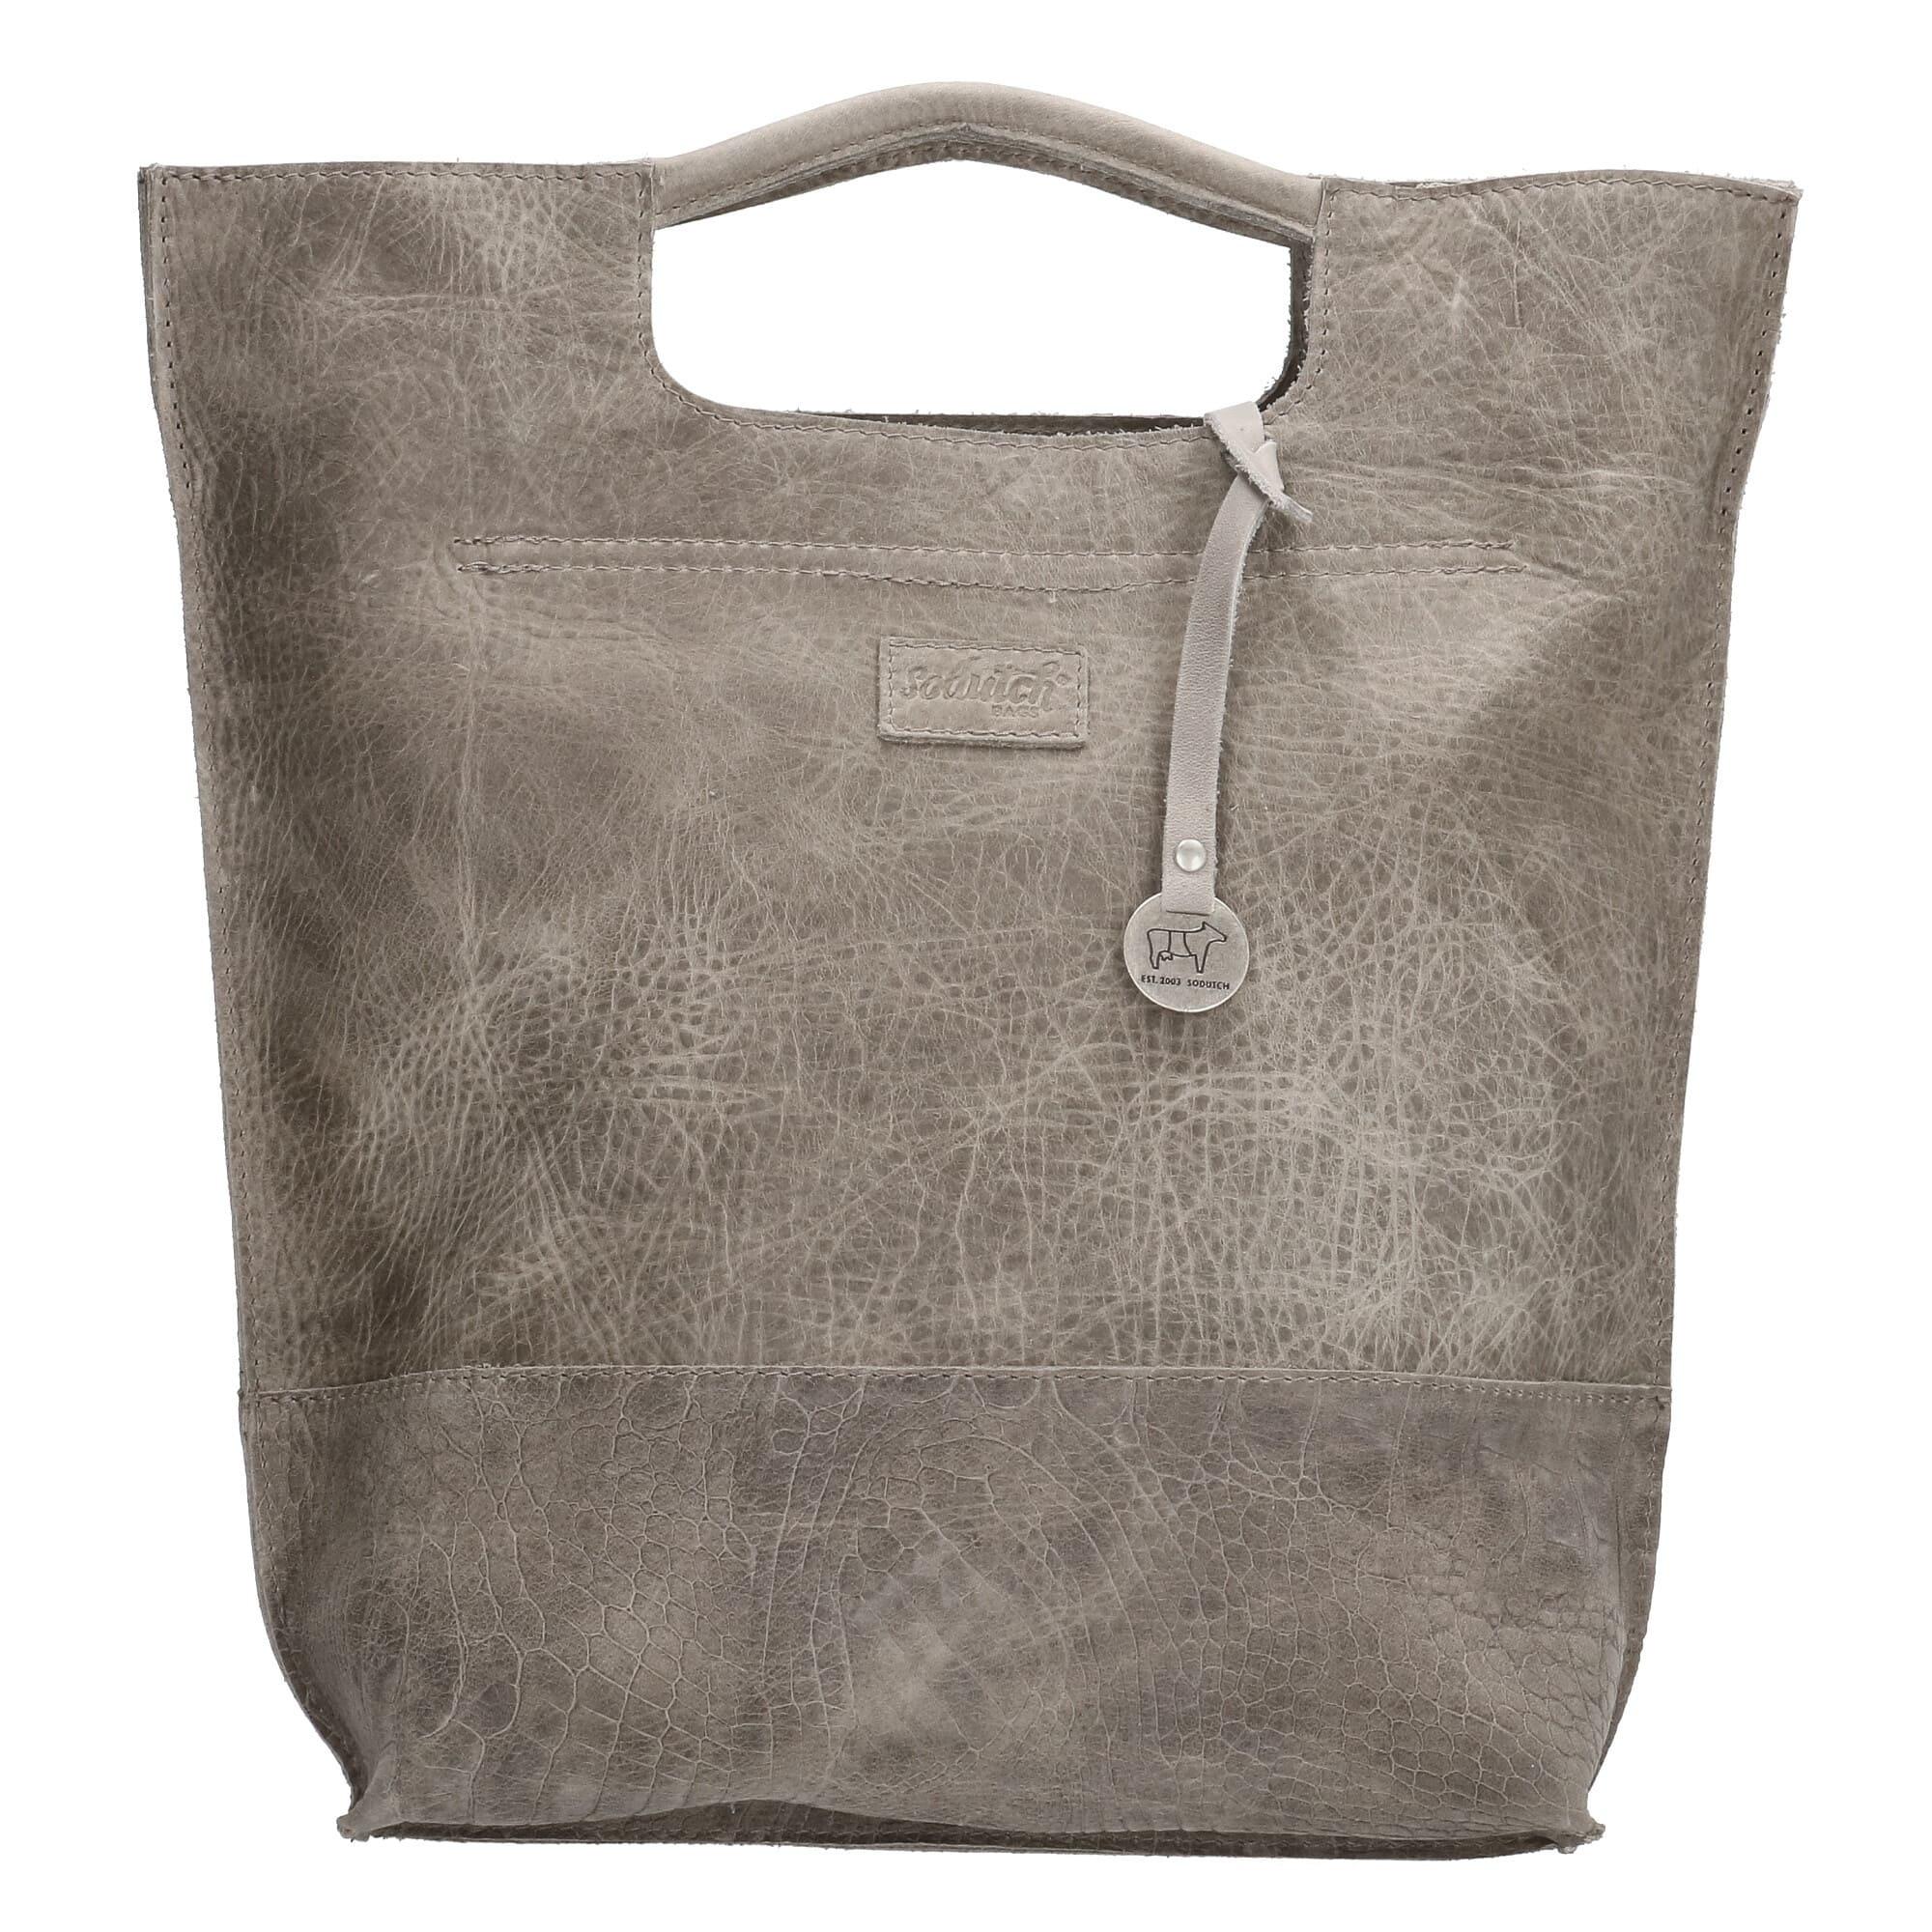 SoDutch Bags Handtas #08 Licht Grijs